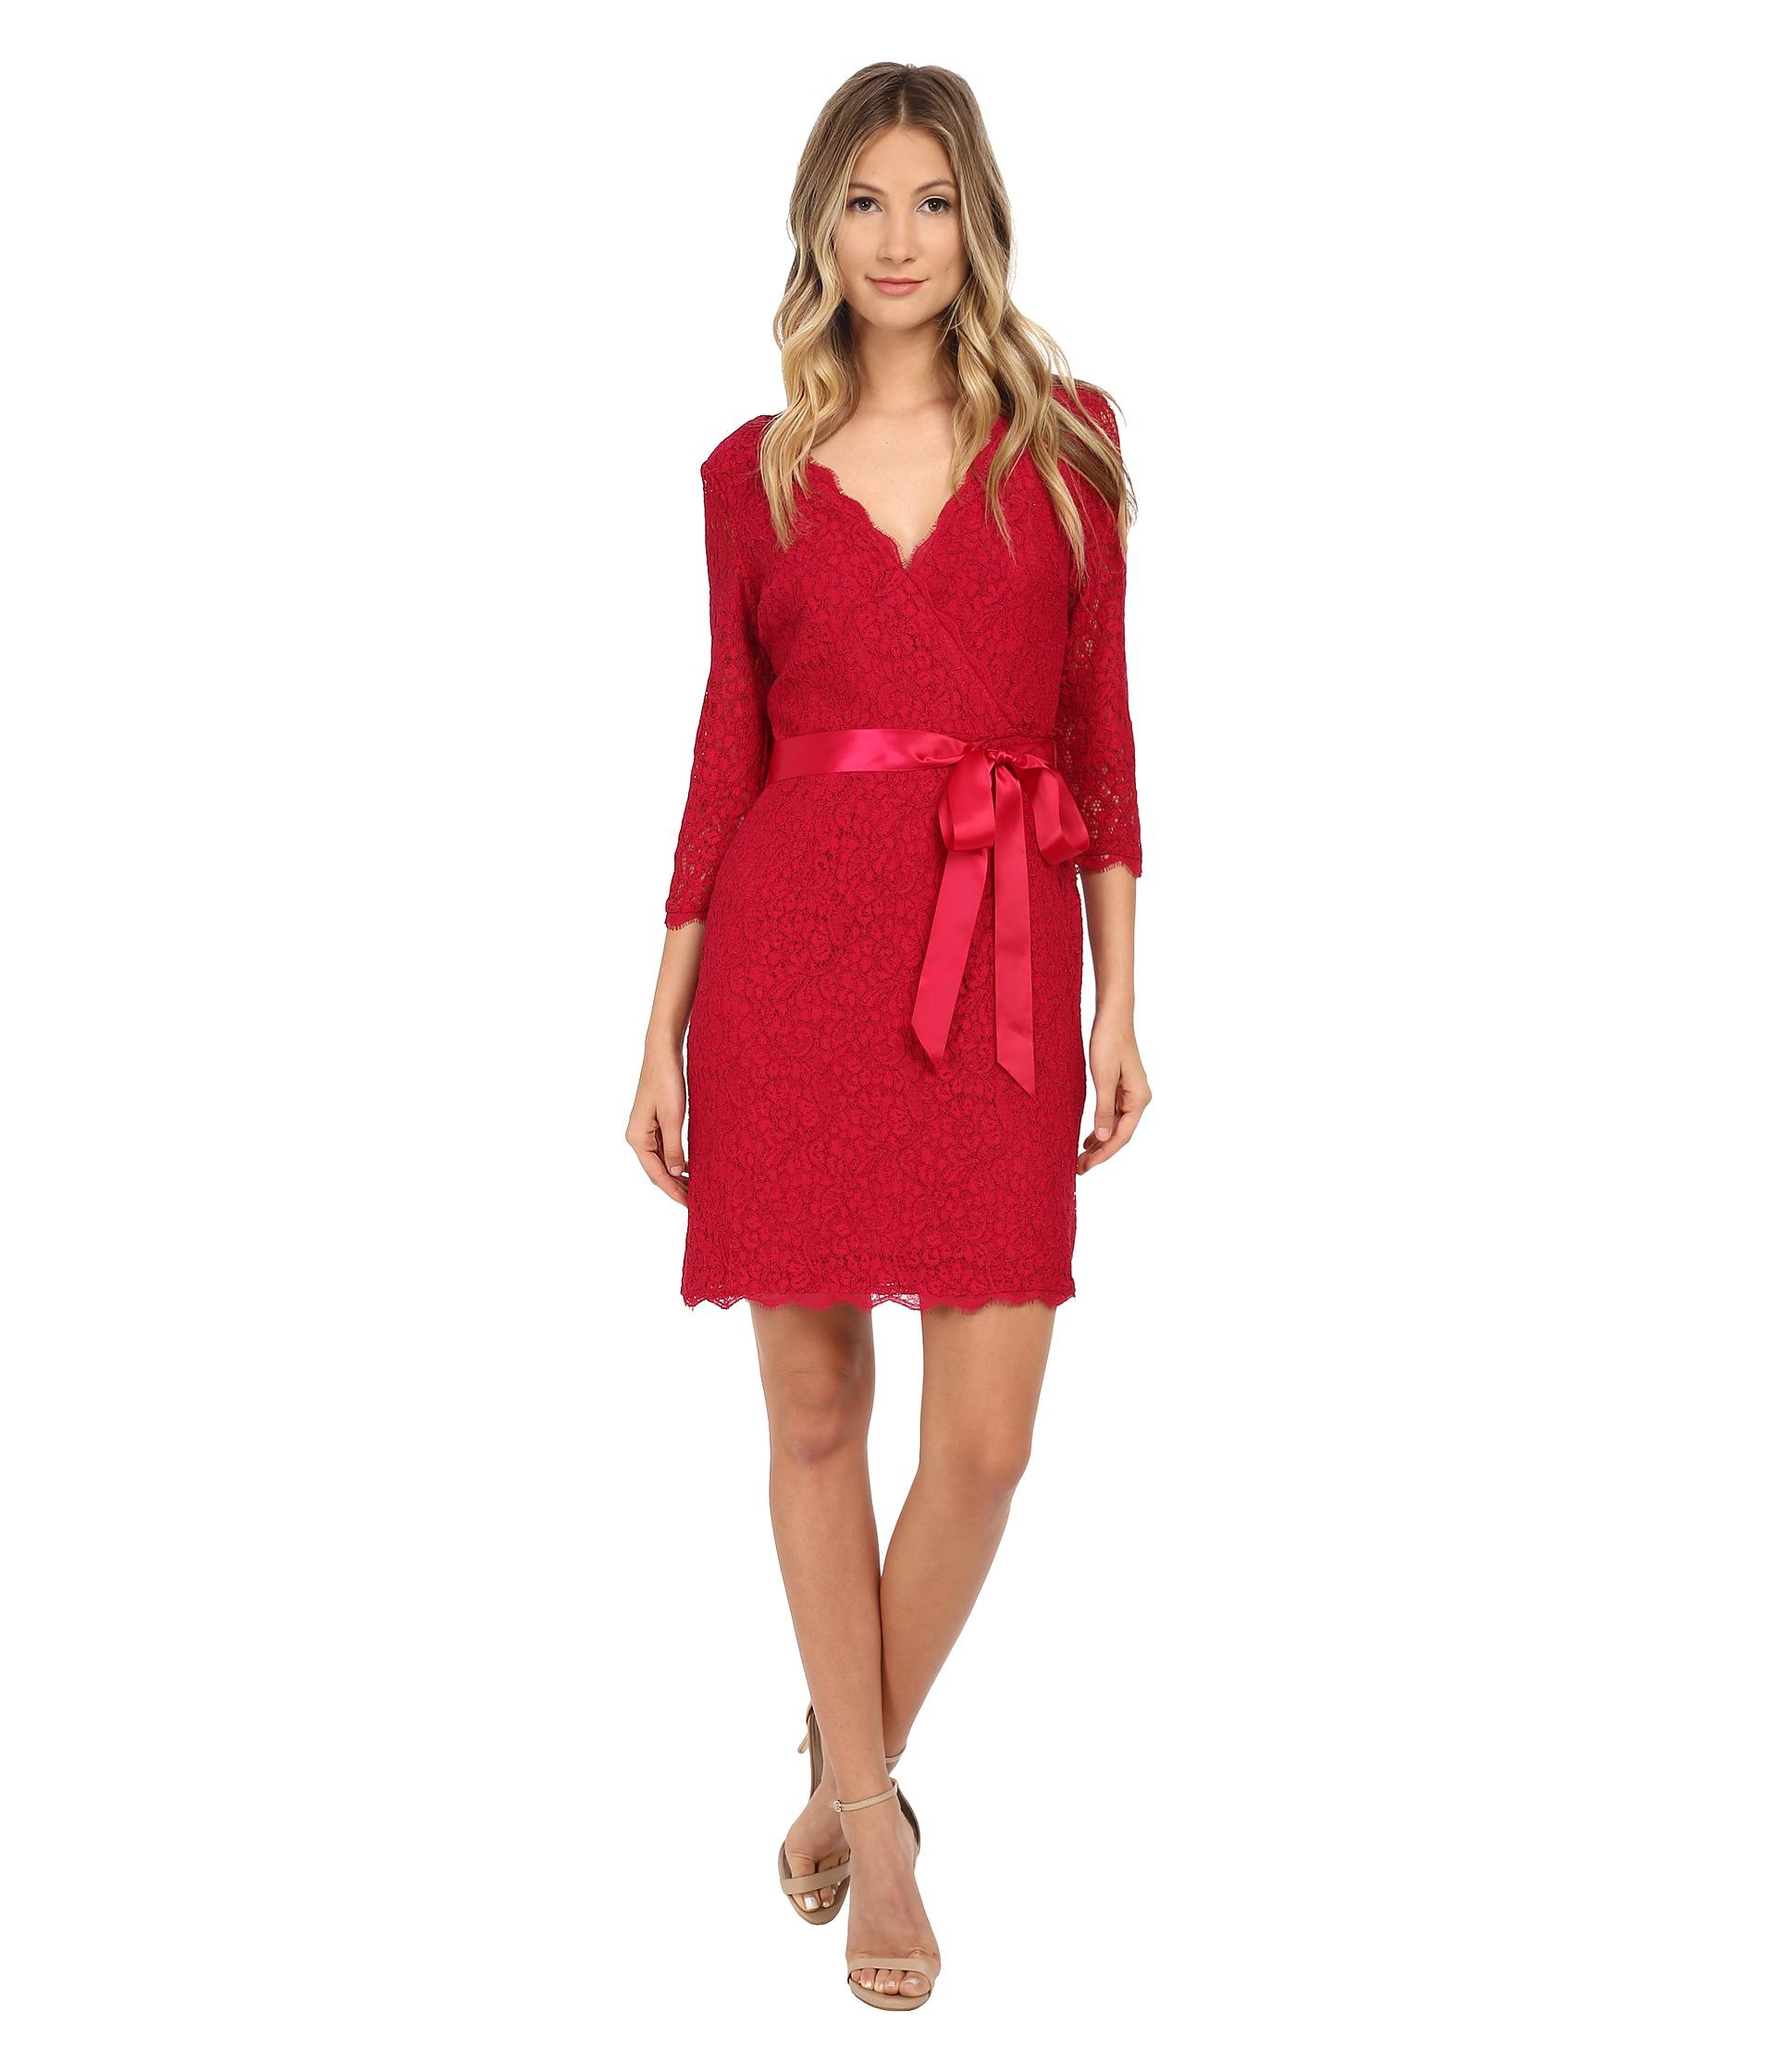 Turmec » red cocktail dresses long sleeve for women